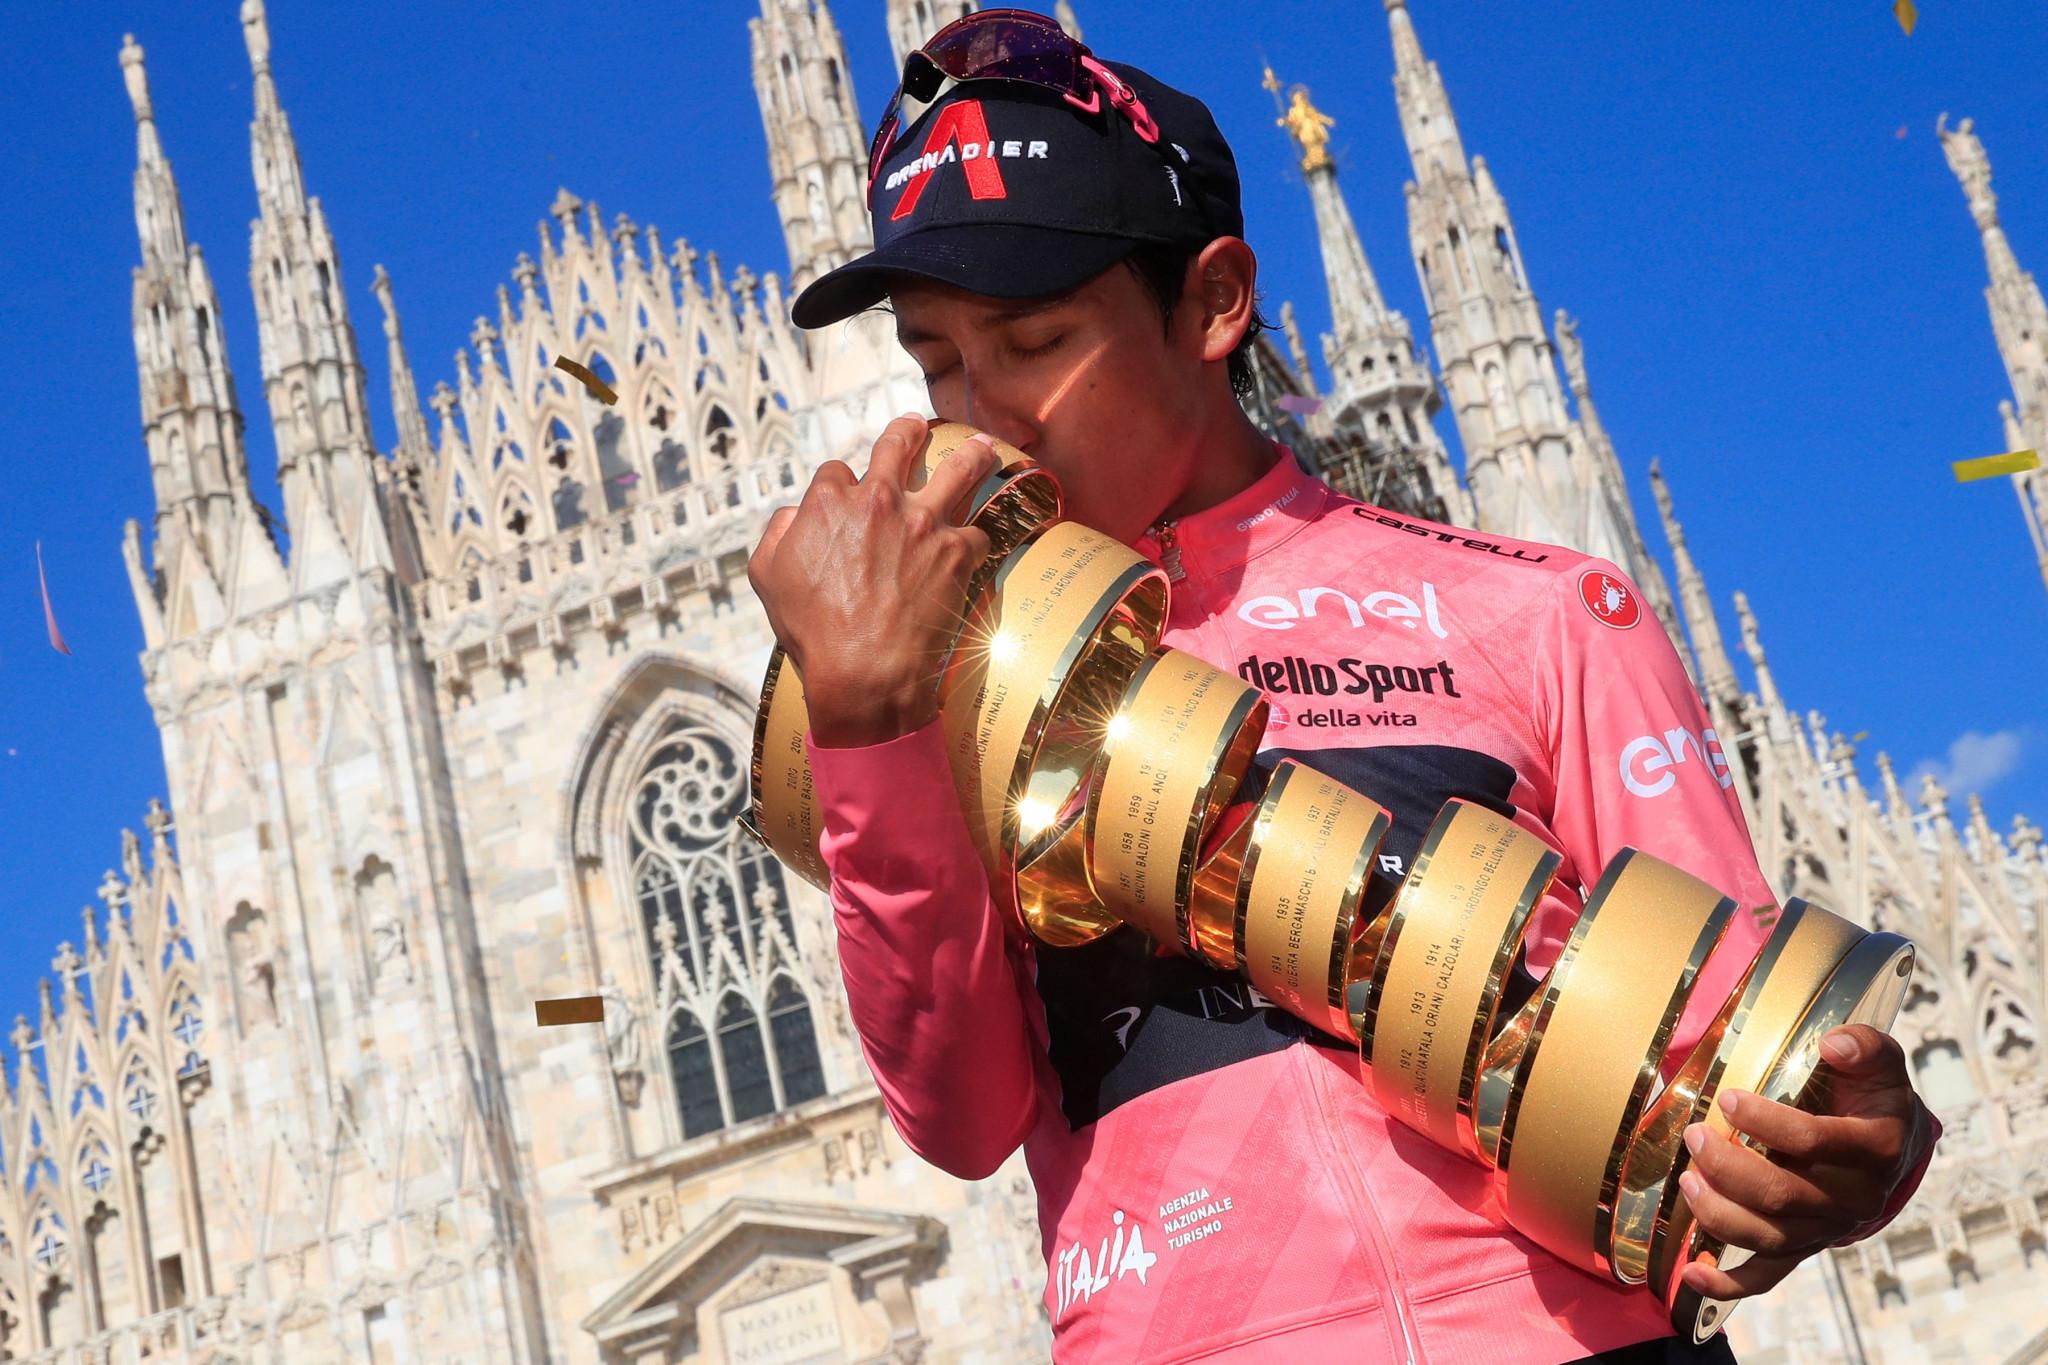 Bernal crowned Giro d'Italia champion as Ganna wins final stage in Milan